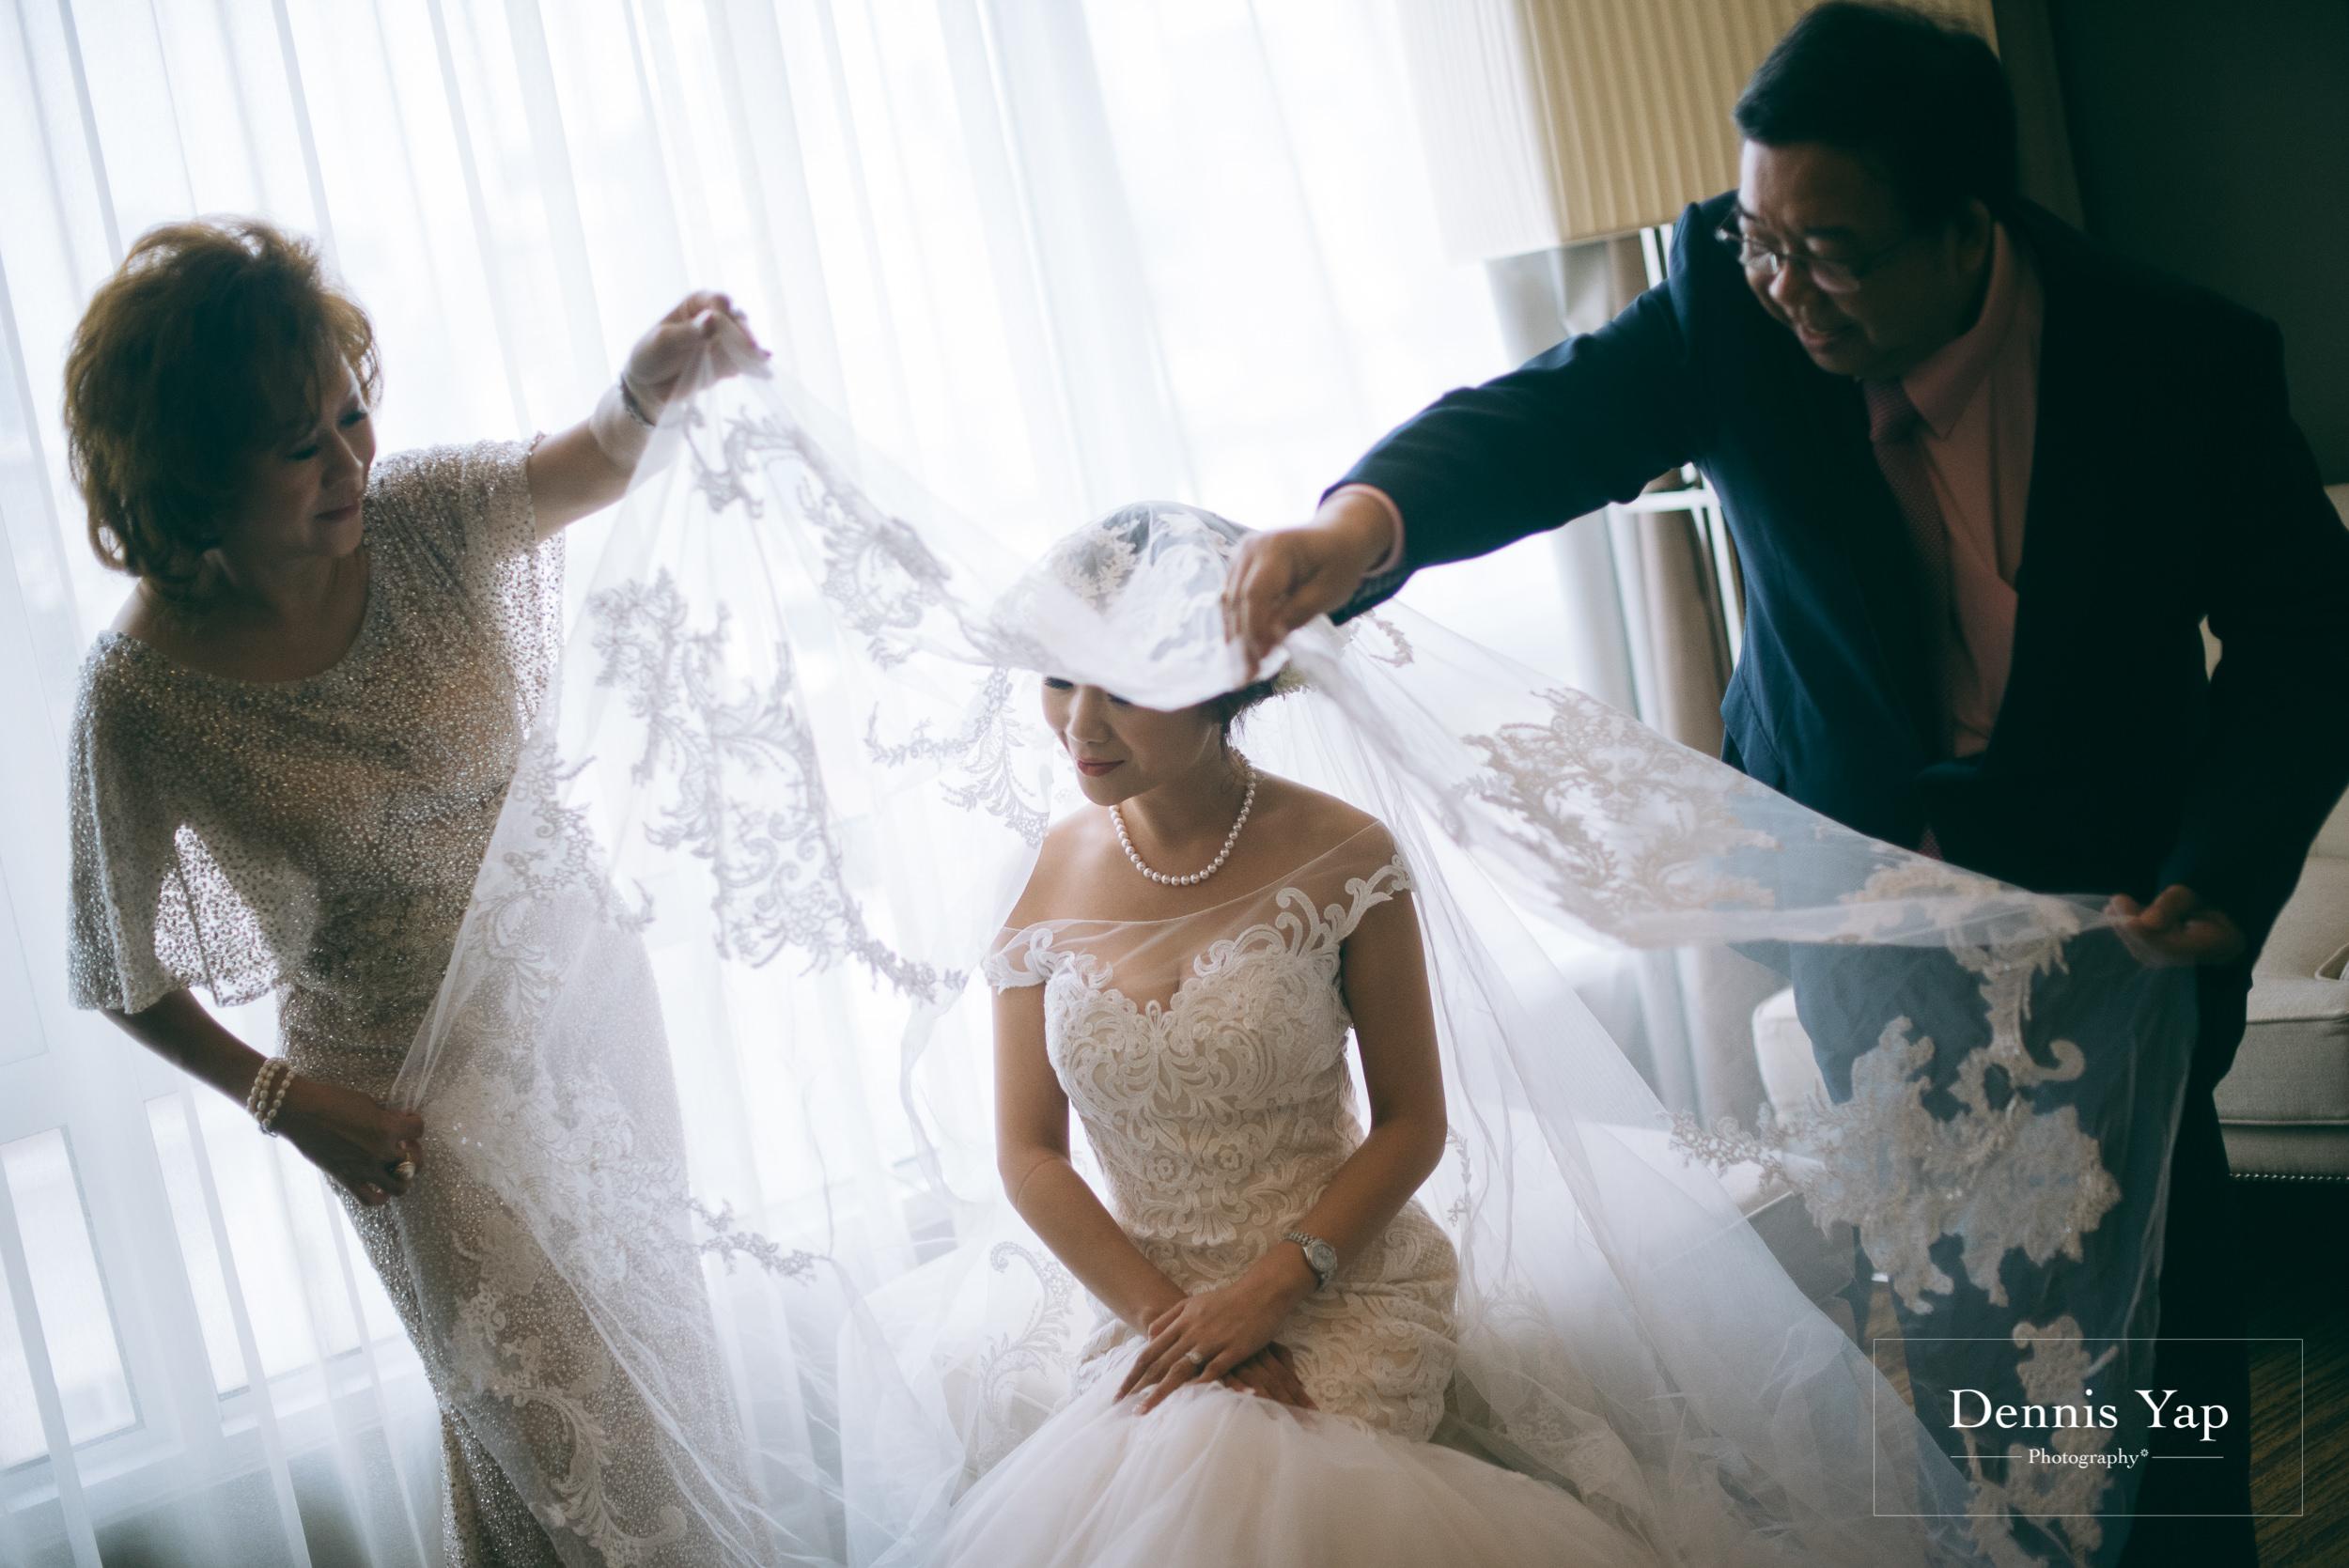 lionel joanne garden wedding majestic hotel dennis yap photography malaysia top wedding photographer-18.jpg